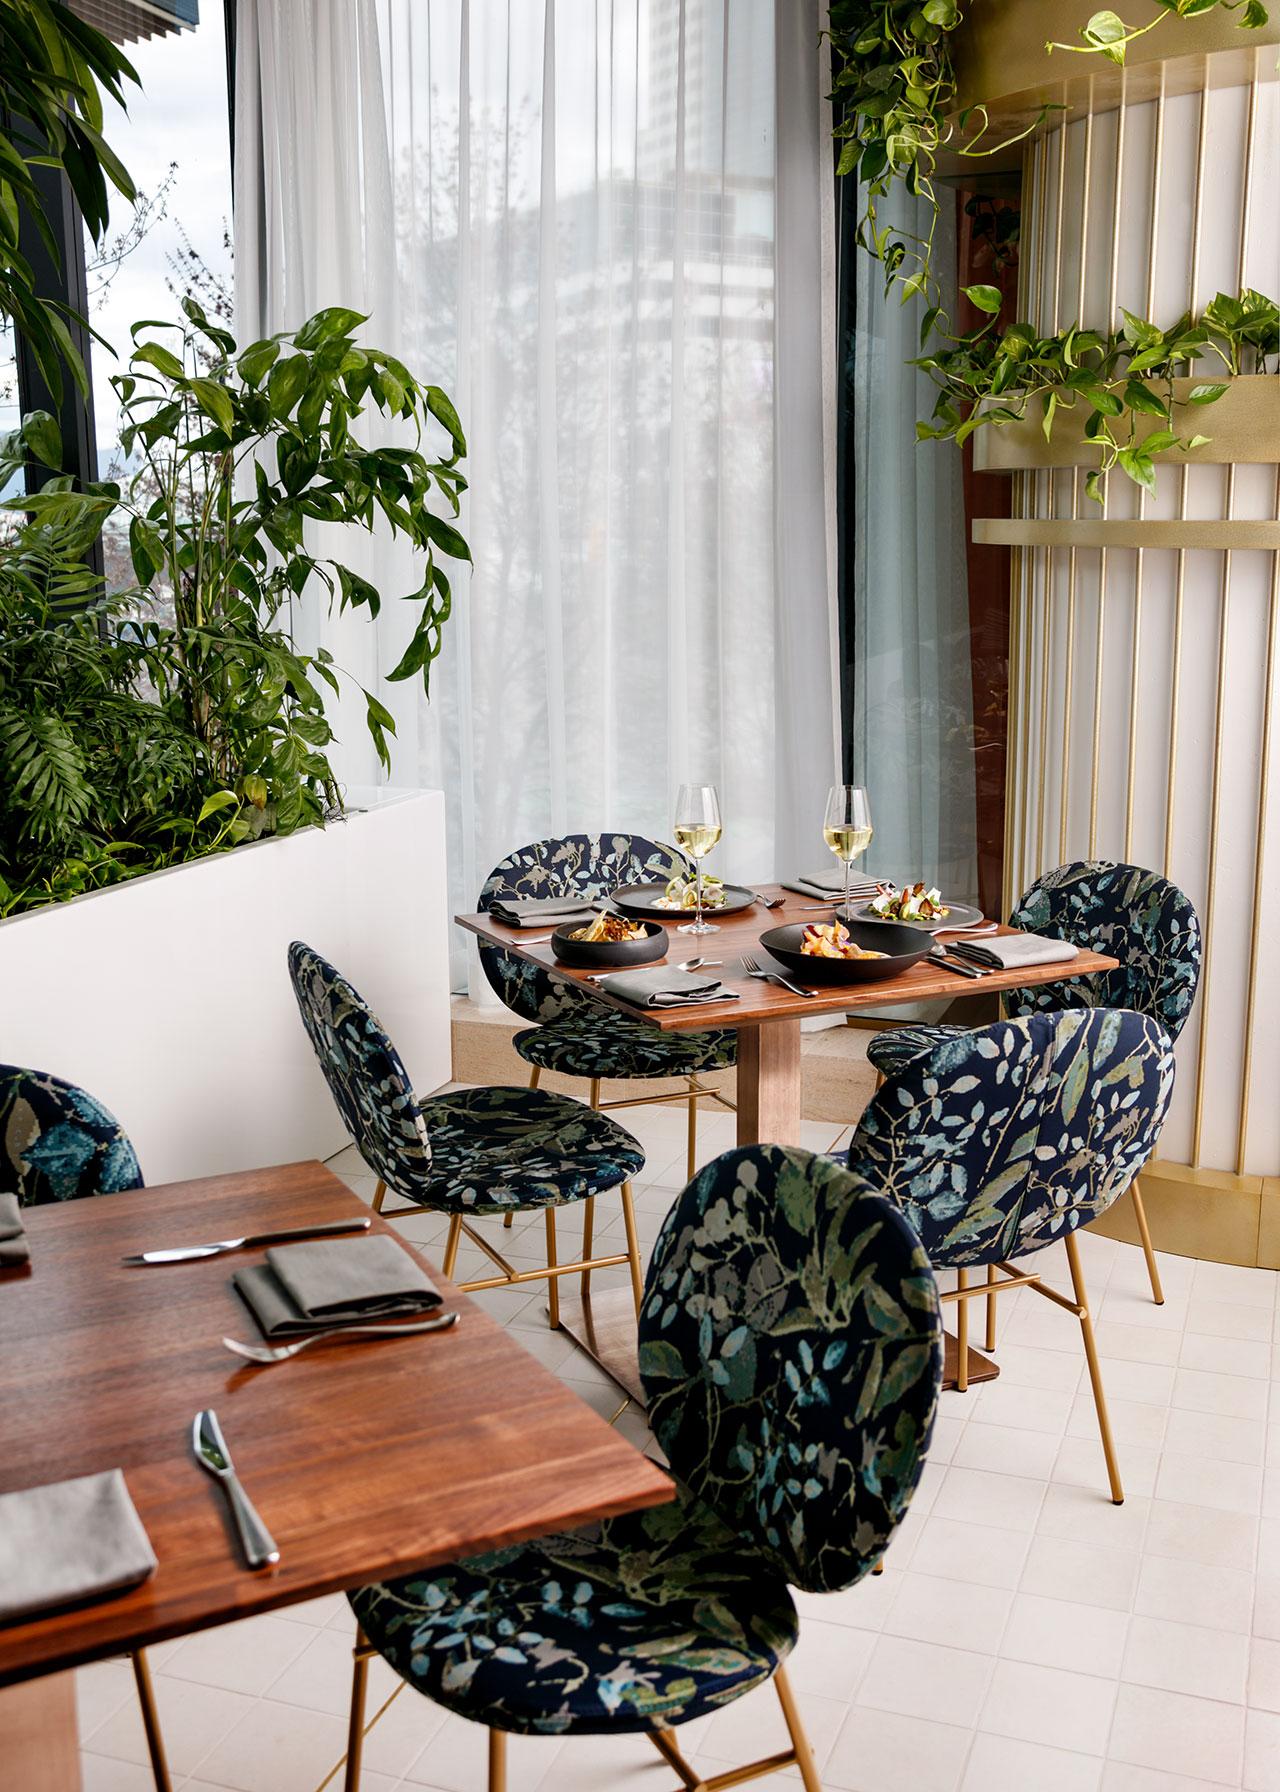 A Mid-Century Modern Restaurant with A Botanical Inspiration 3